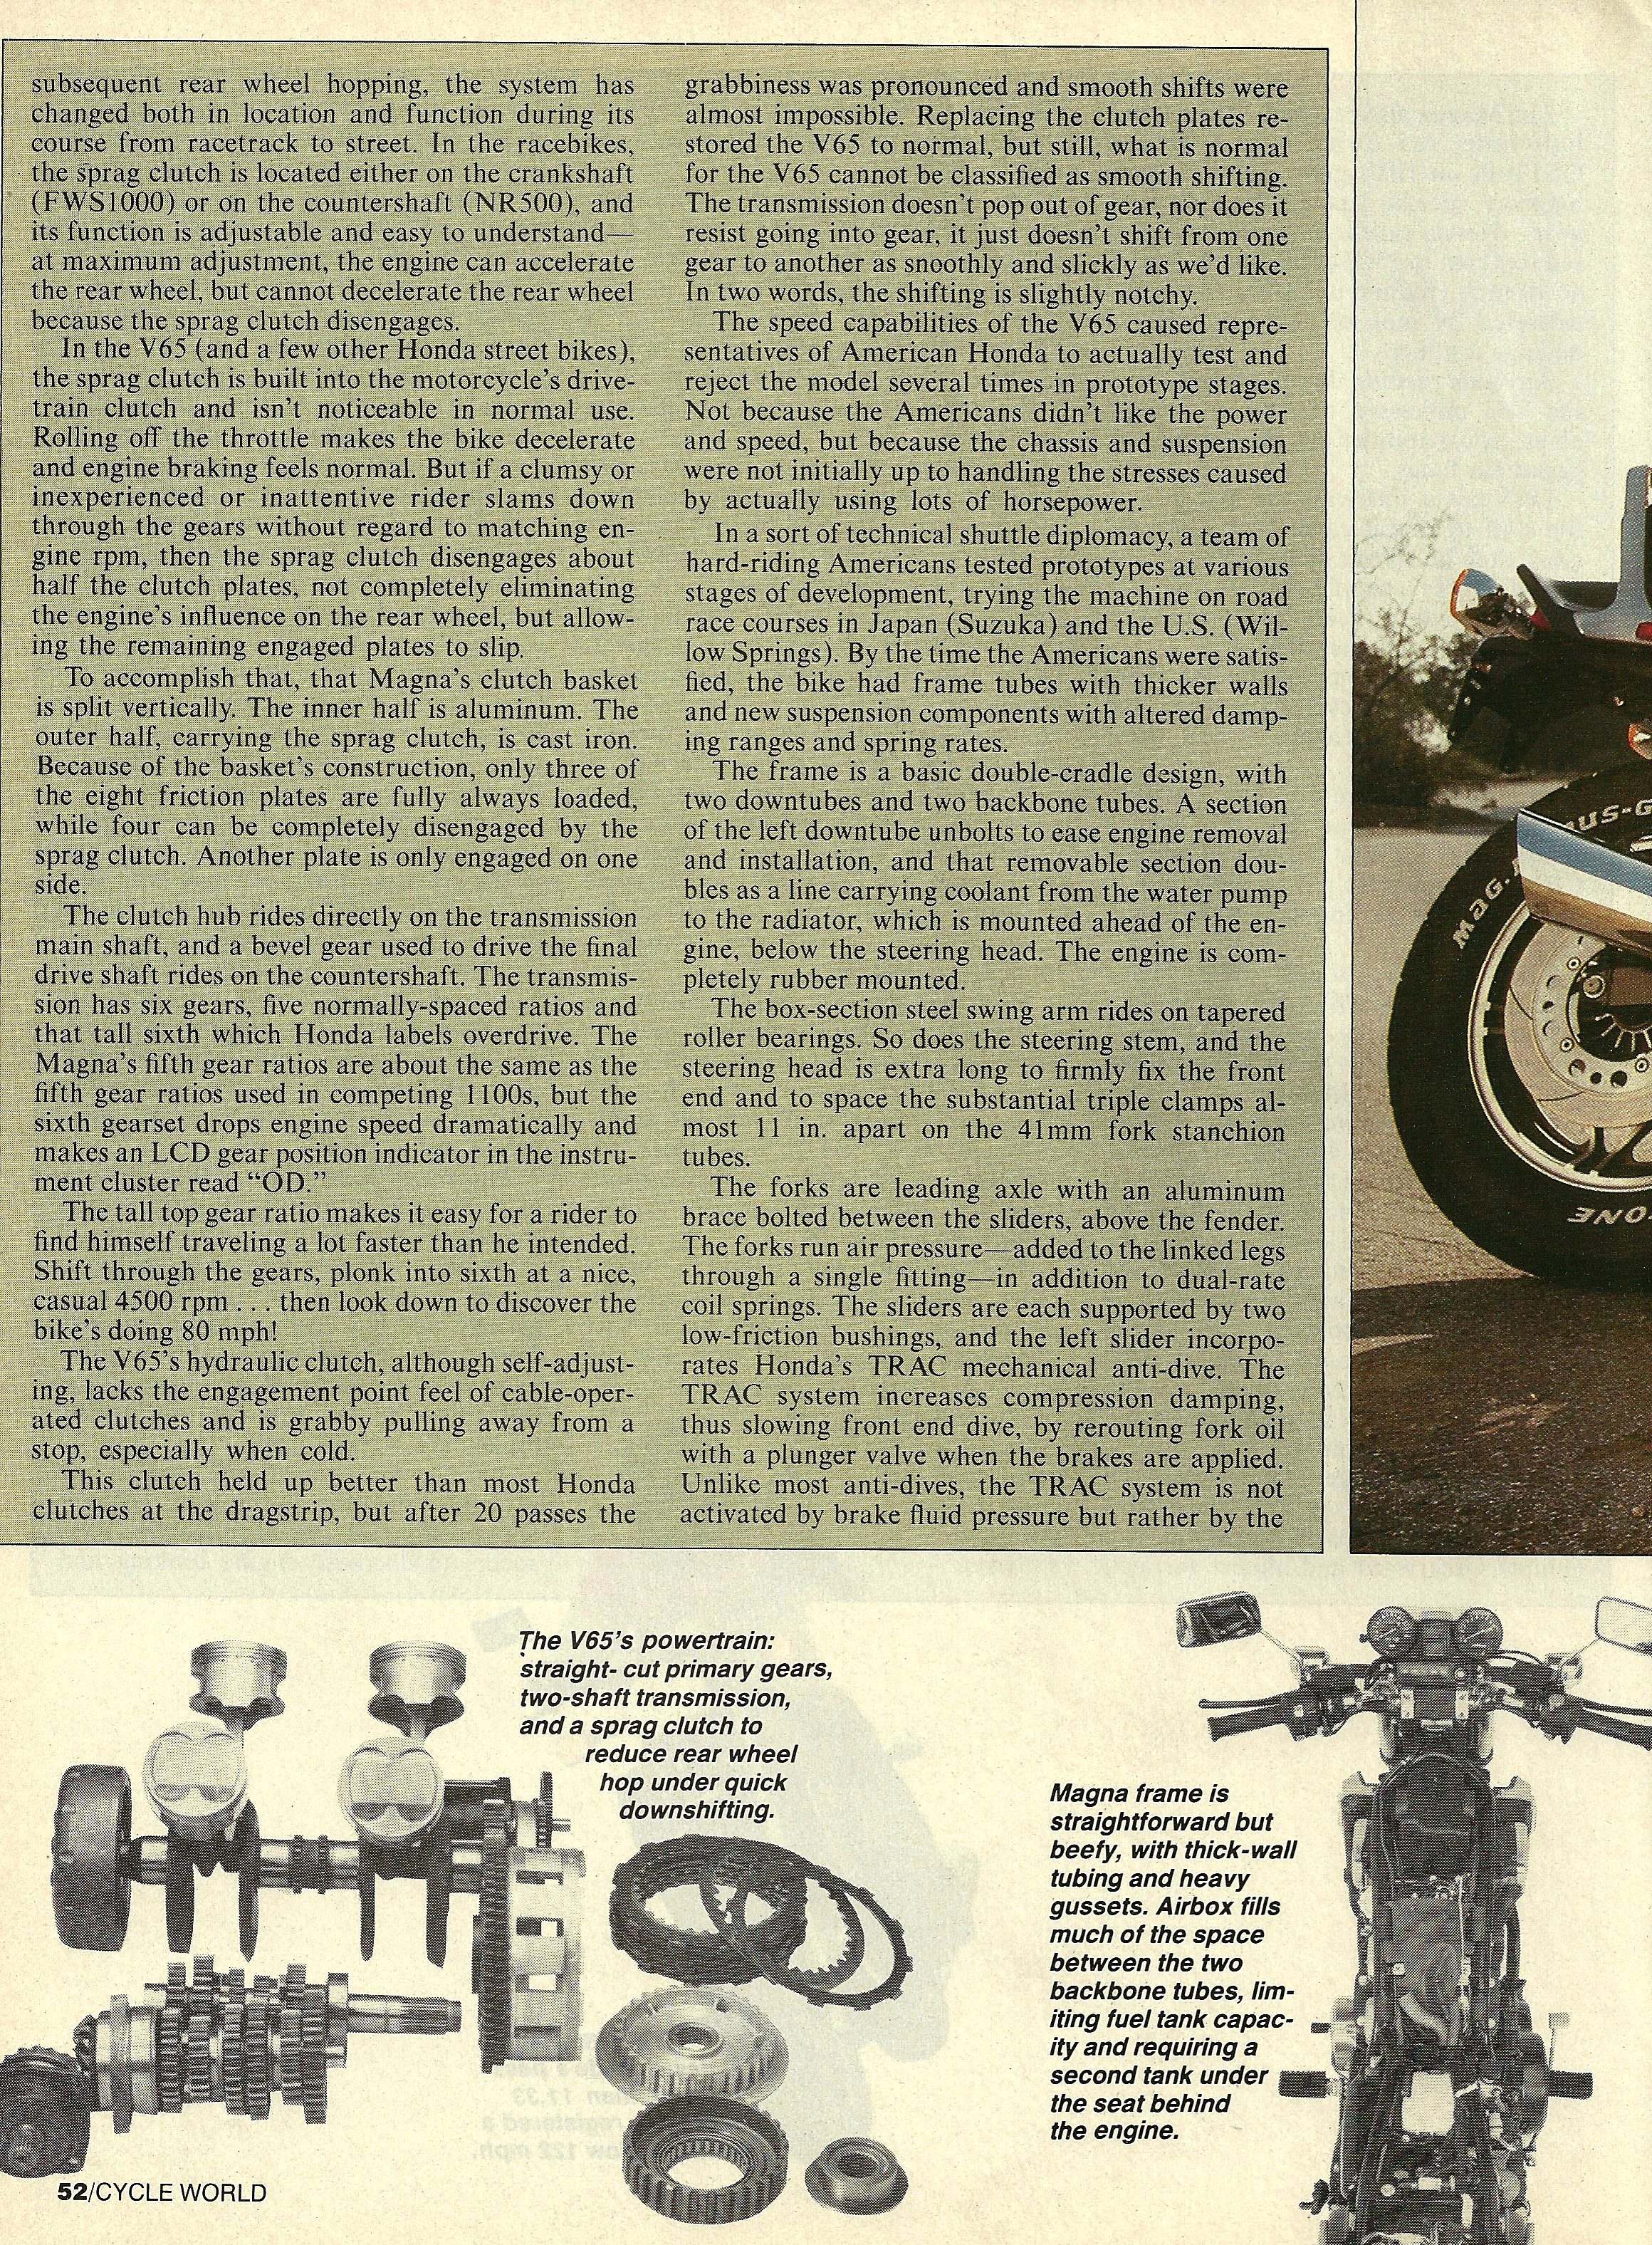 1983 Honda V65 Magna 05.jpg